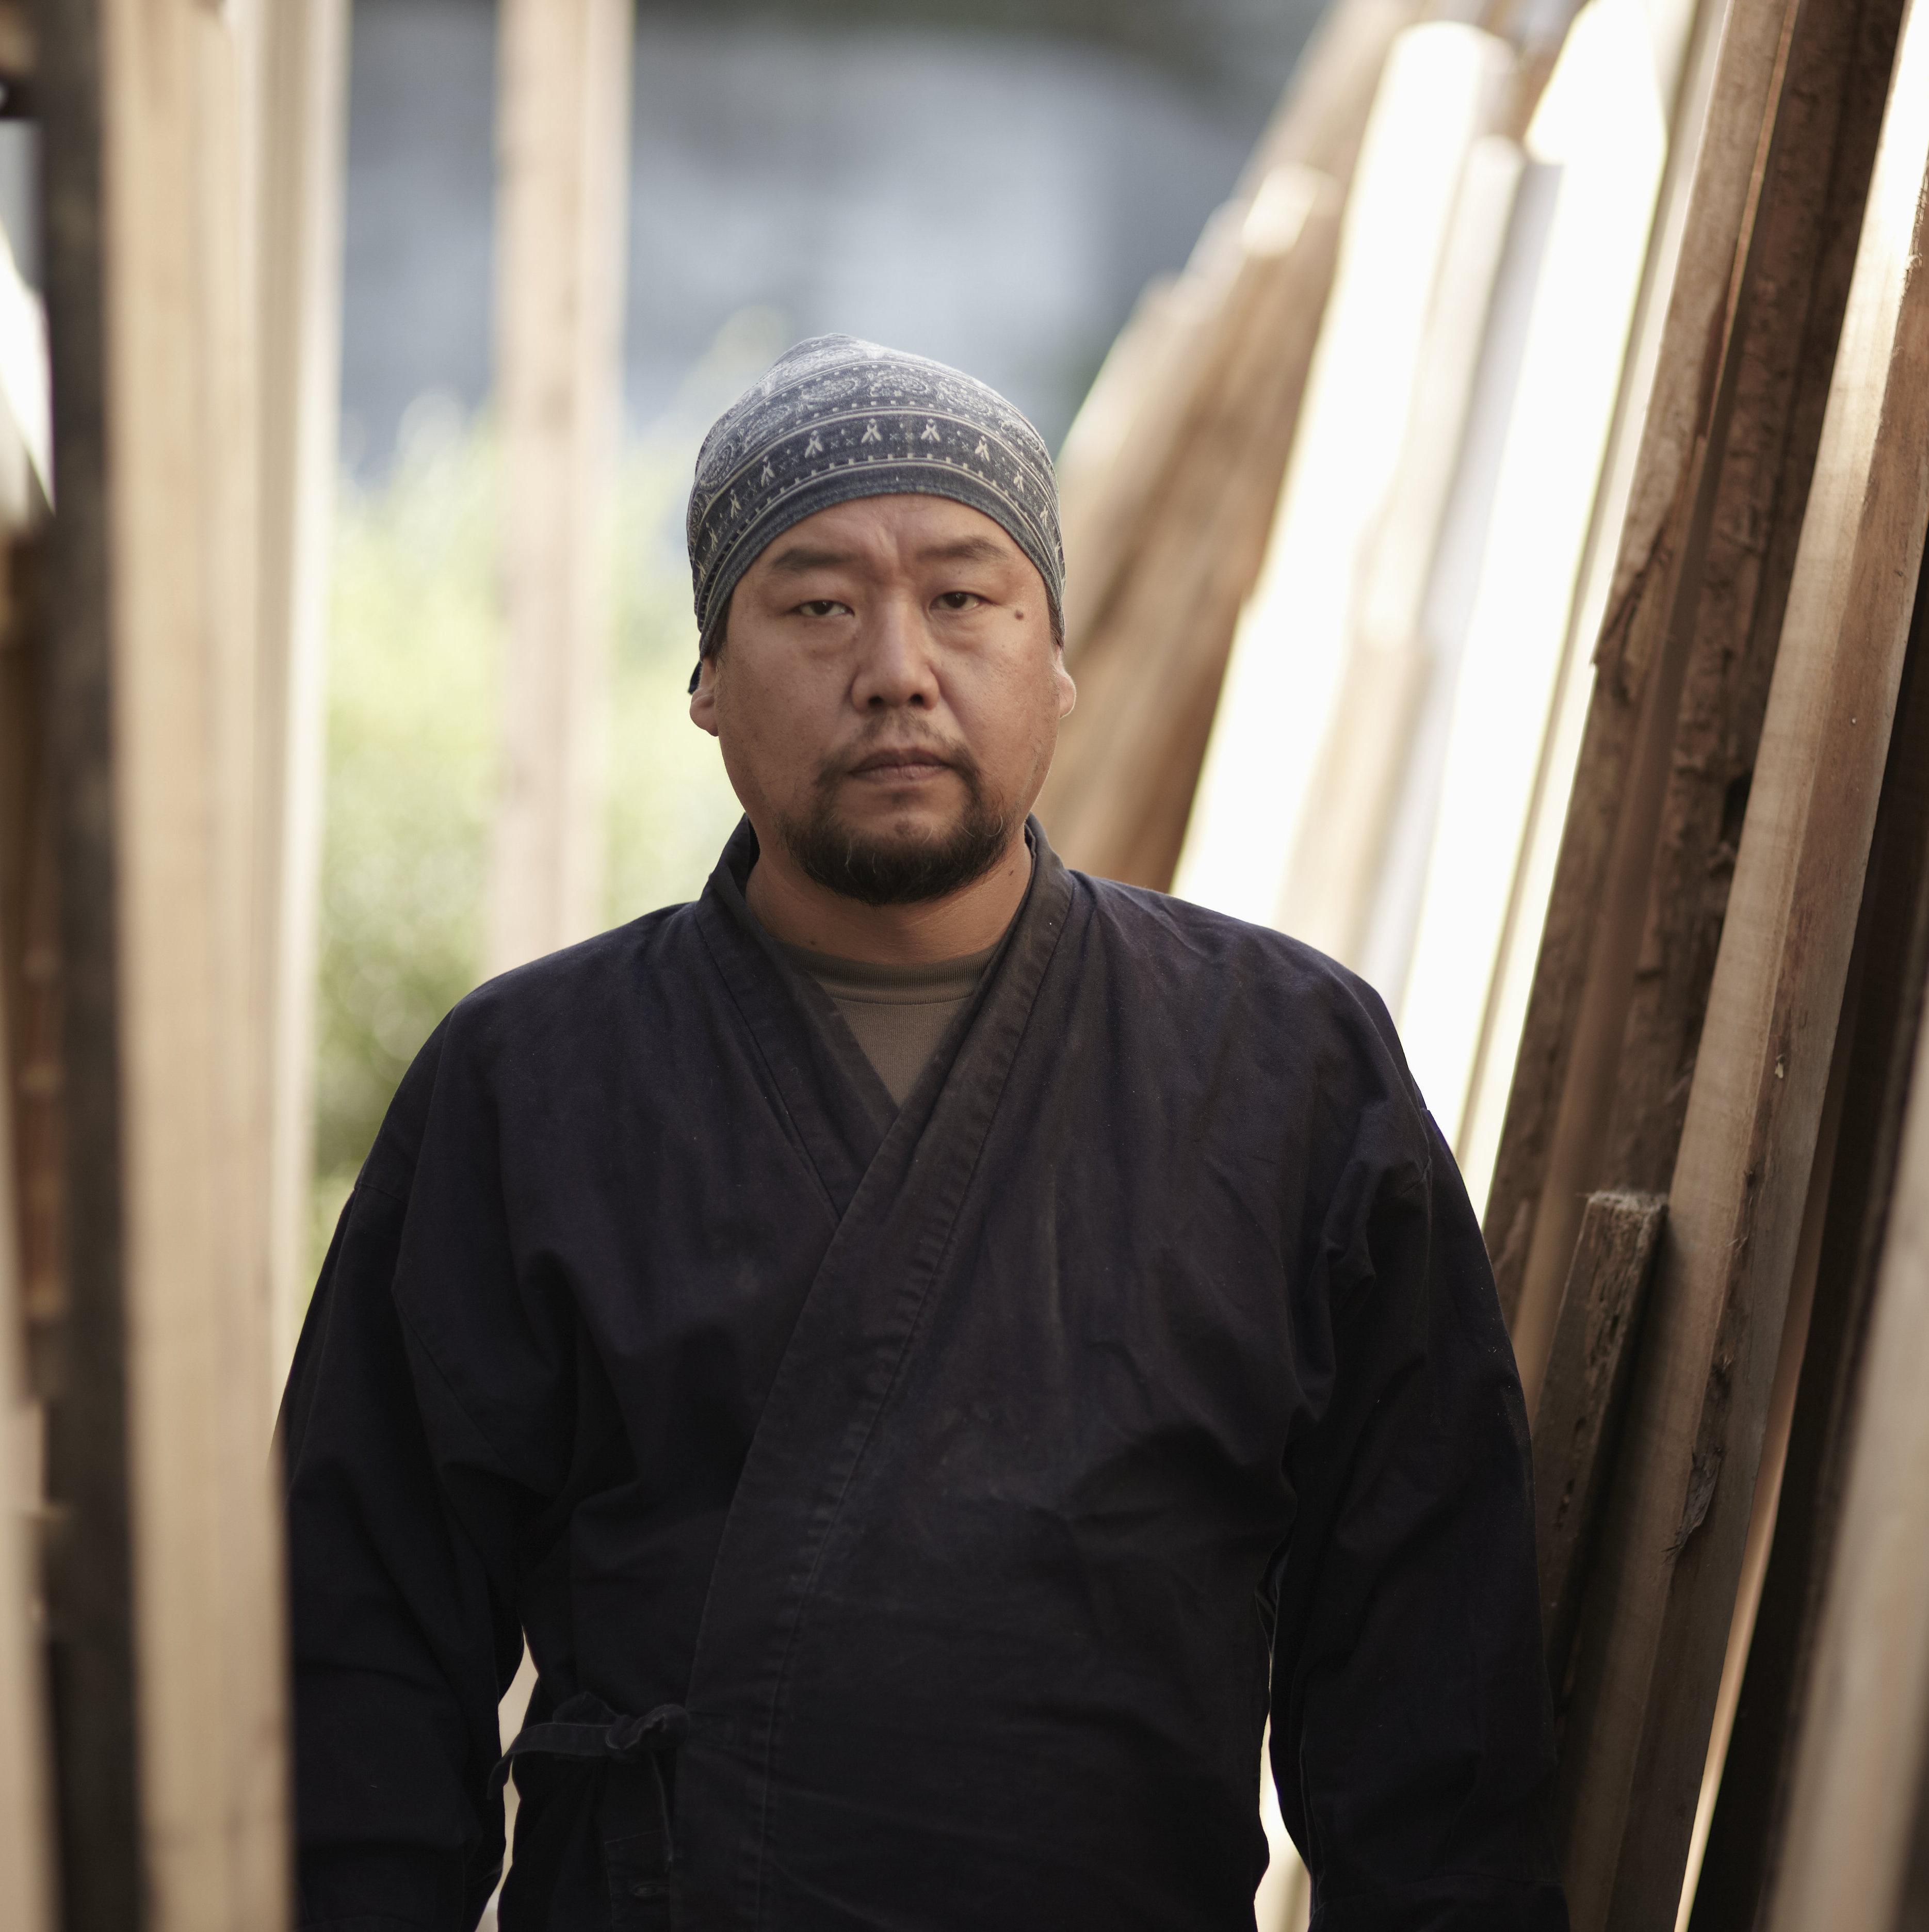 中川木工芸 比良工房の画像